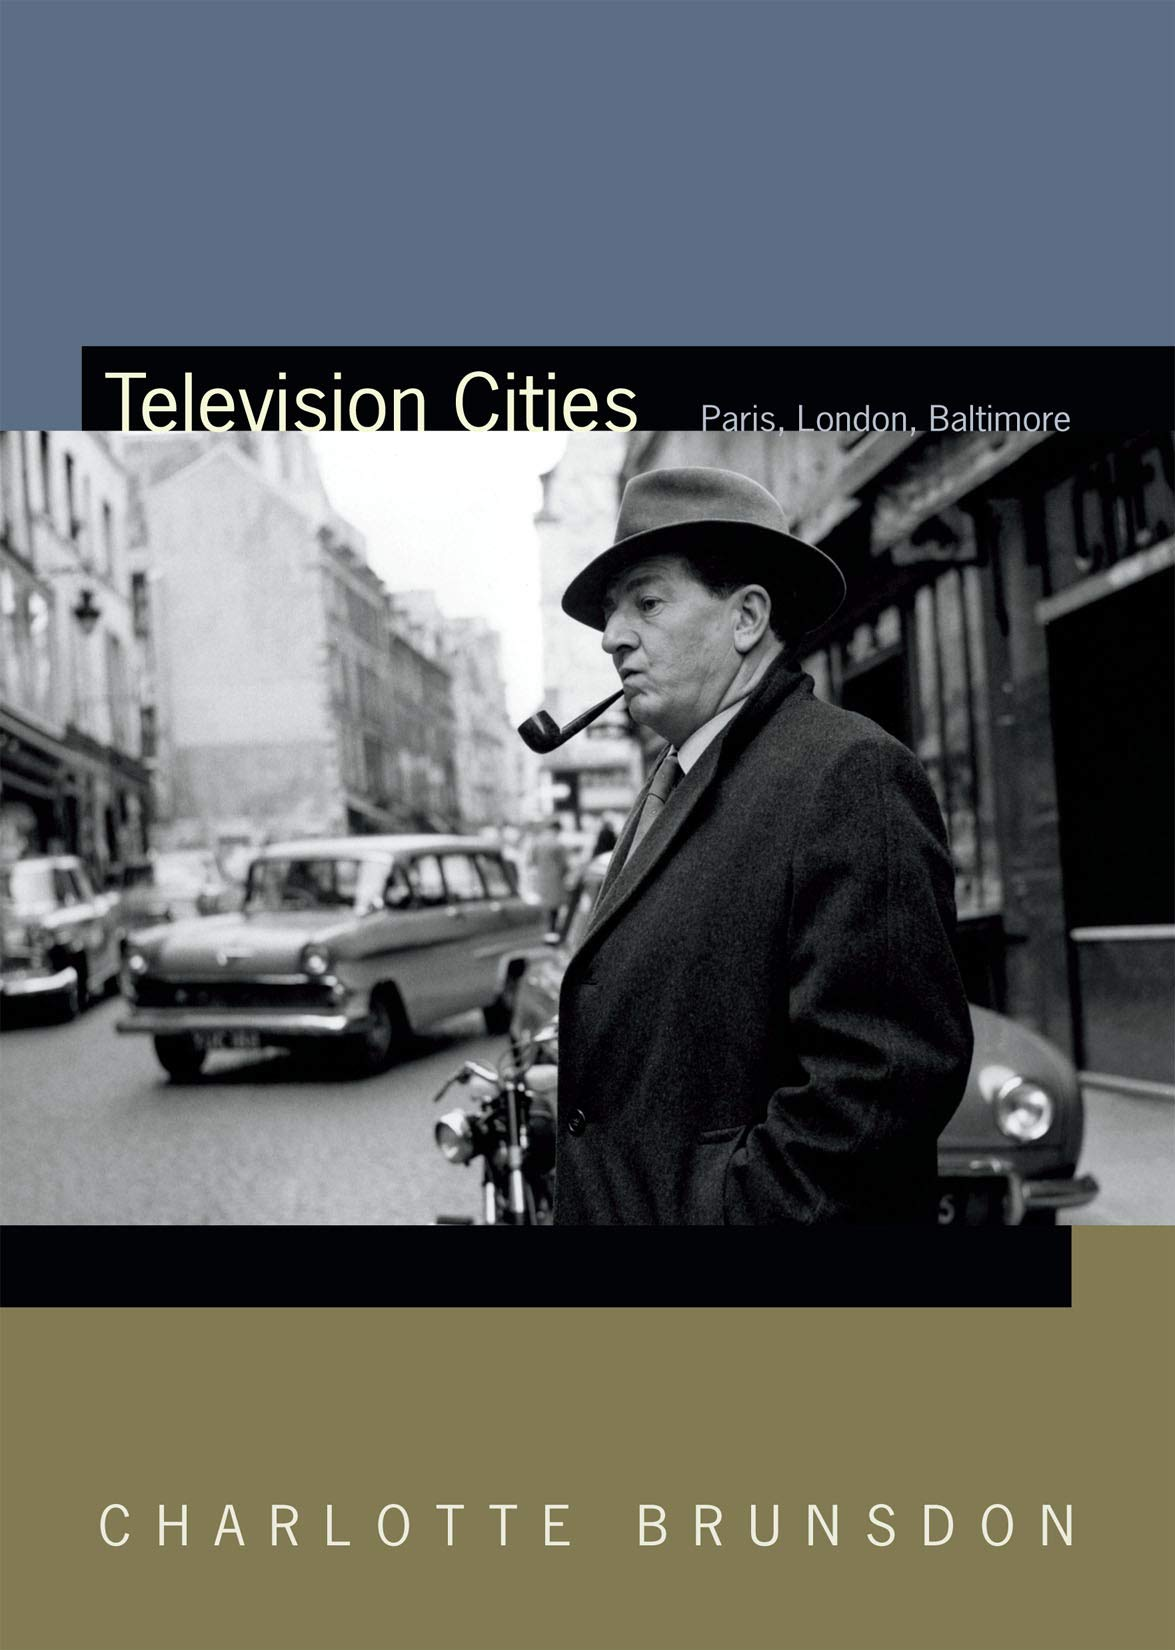 Television Cities: Paris, London, Baltimore (Spin Offs): Amazon.co.uk:  Charlotte Brunsdon: 9780822368946: Books